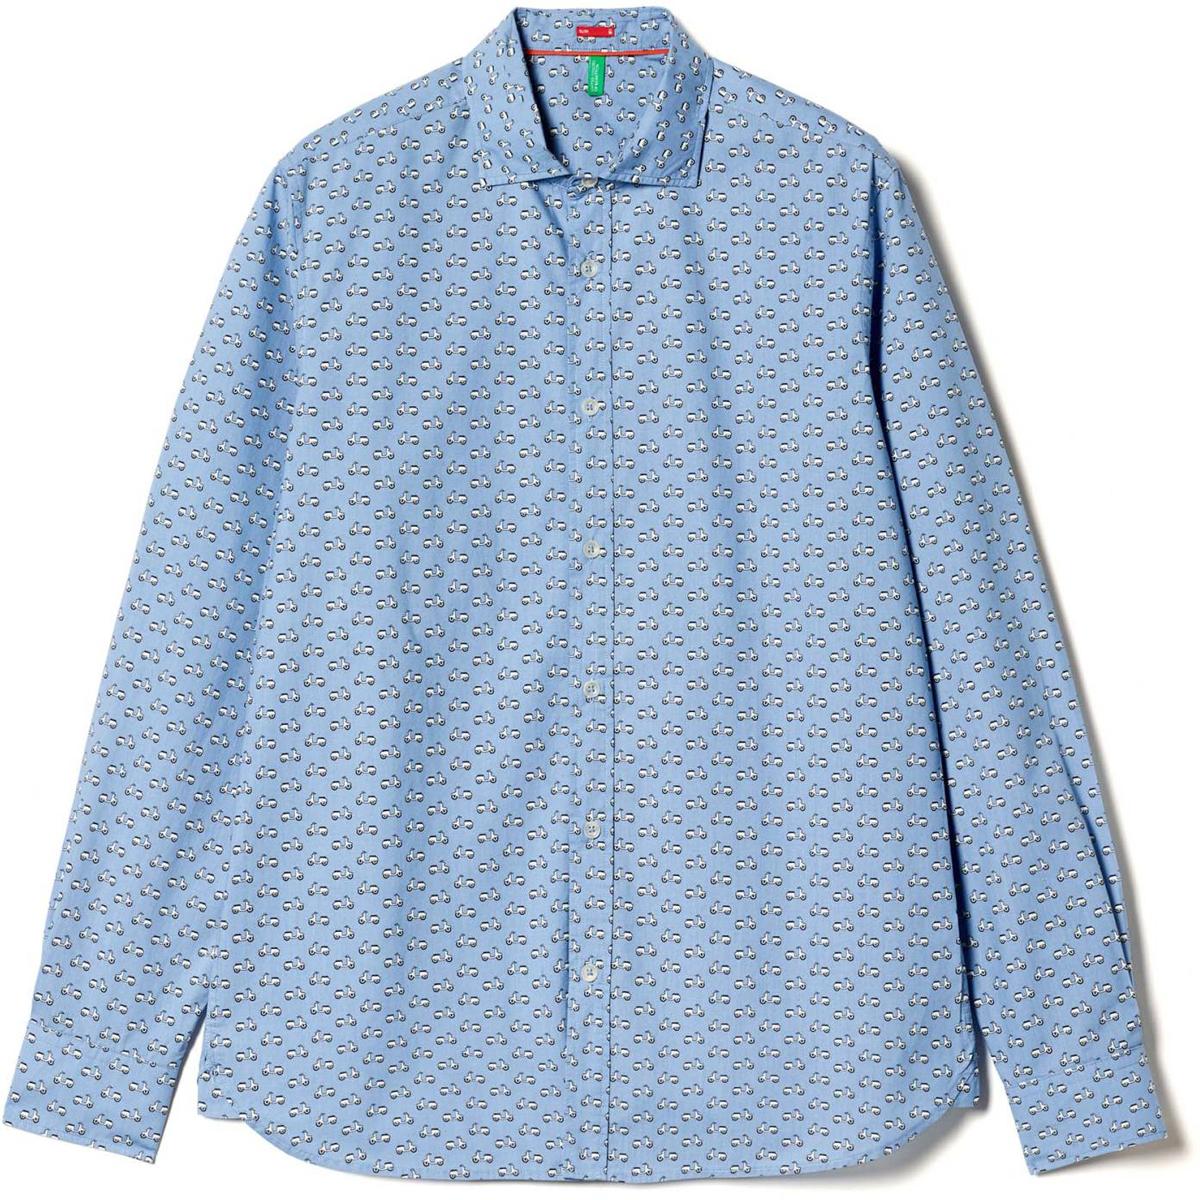 Рубашка муж United Colors of Benetton, цвет: голубой. 5BWF5QBN8_919. Размер M (48/50)5BWF5QBN8_919